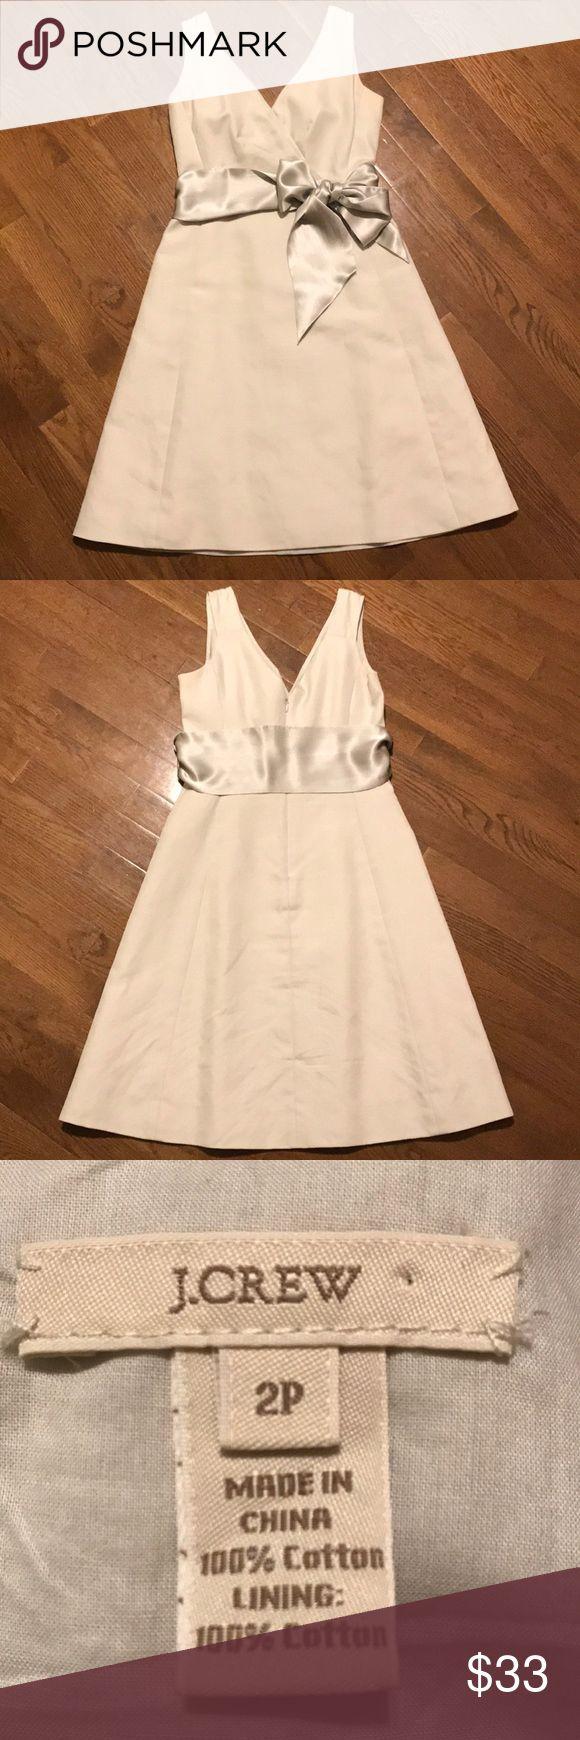 "J. Crew cream color dress with sash size 2P Beautiful cream colored A-line linen dress with 4.5"" satin sash. Lined. Zipper back. Worn once to a graduation. TTS. Smoke free/pet free home J. Crew Dresses"